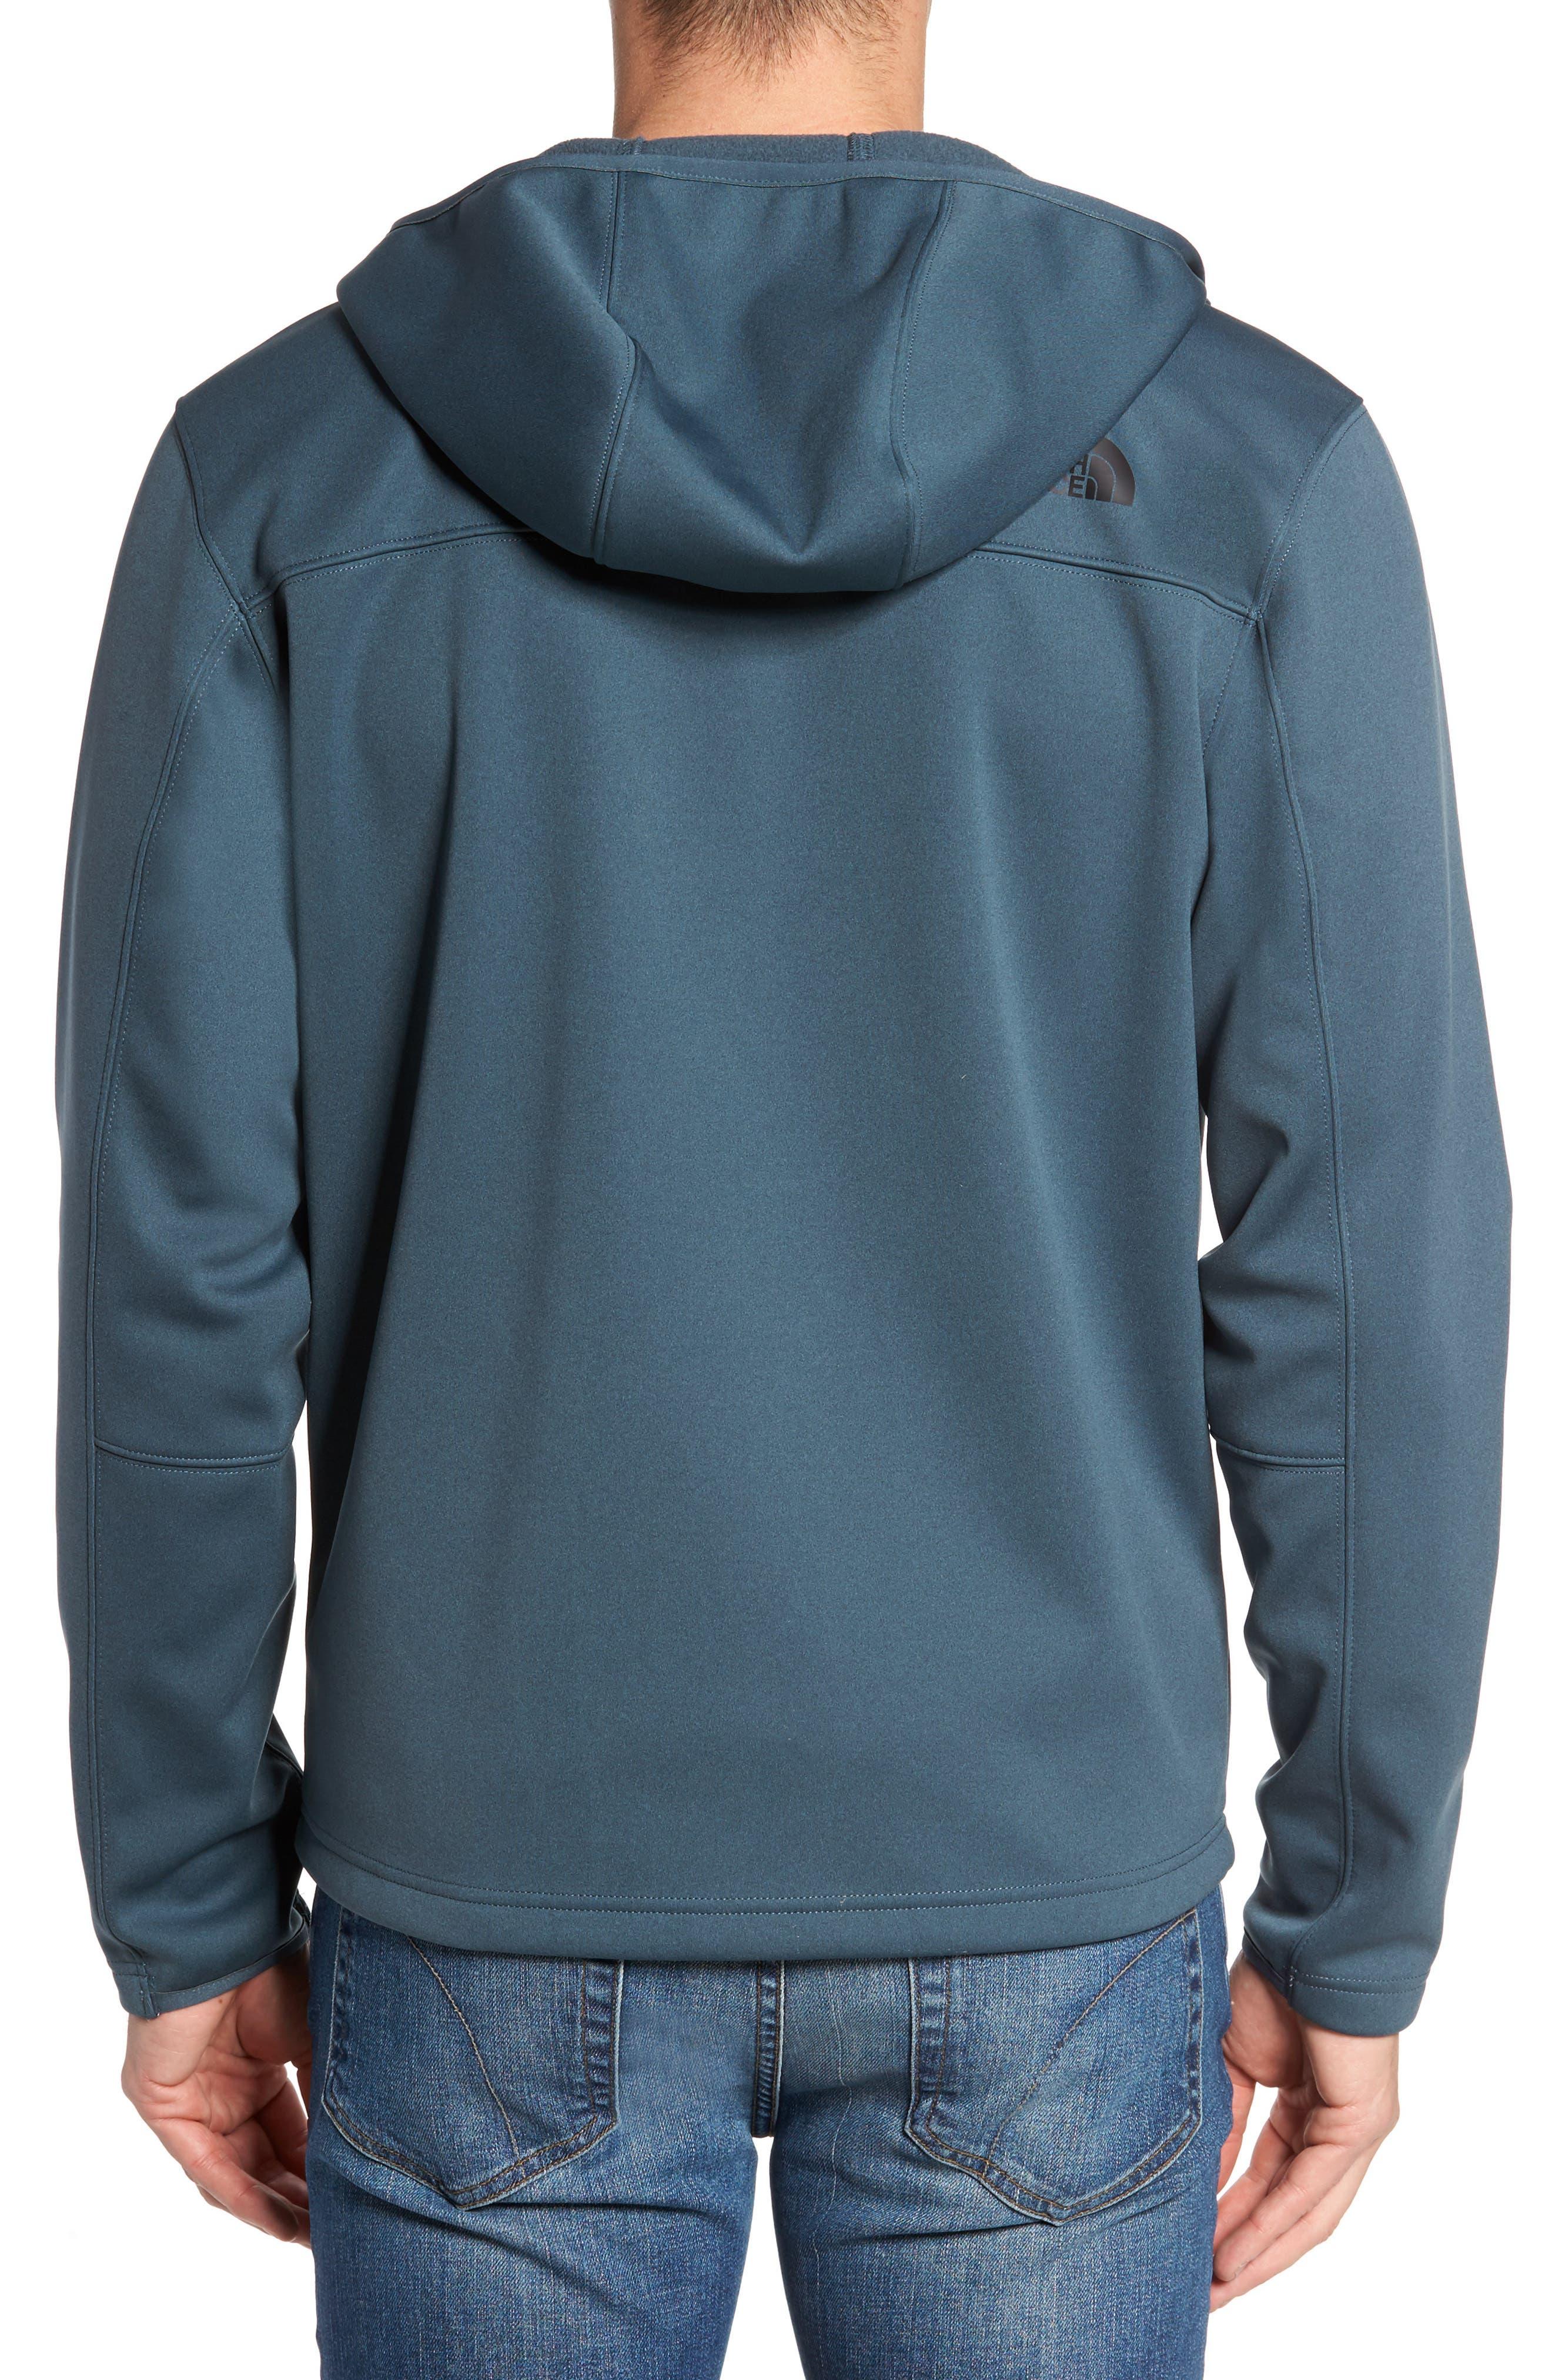 Apex Risor Jacket,                             Alternate thumbnail 2, color,                             Conquer Blue Heather